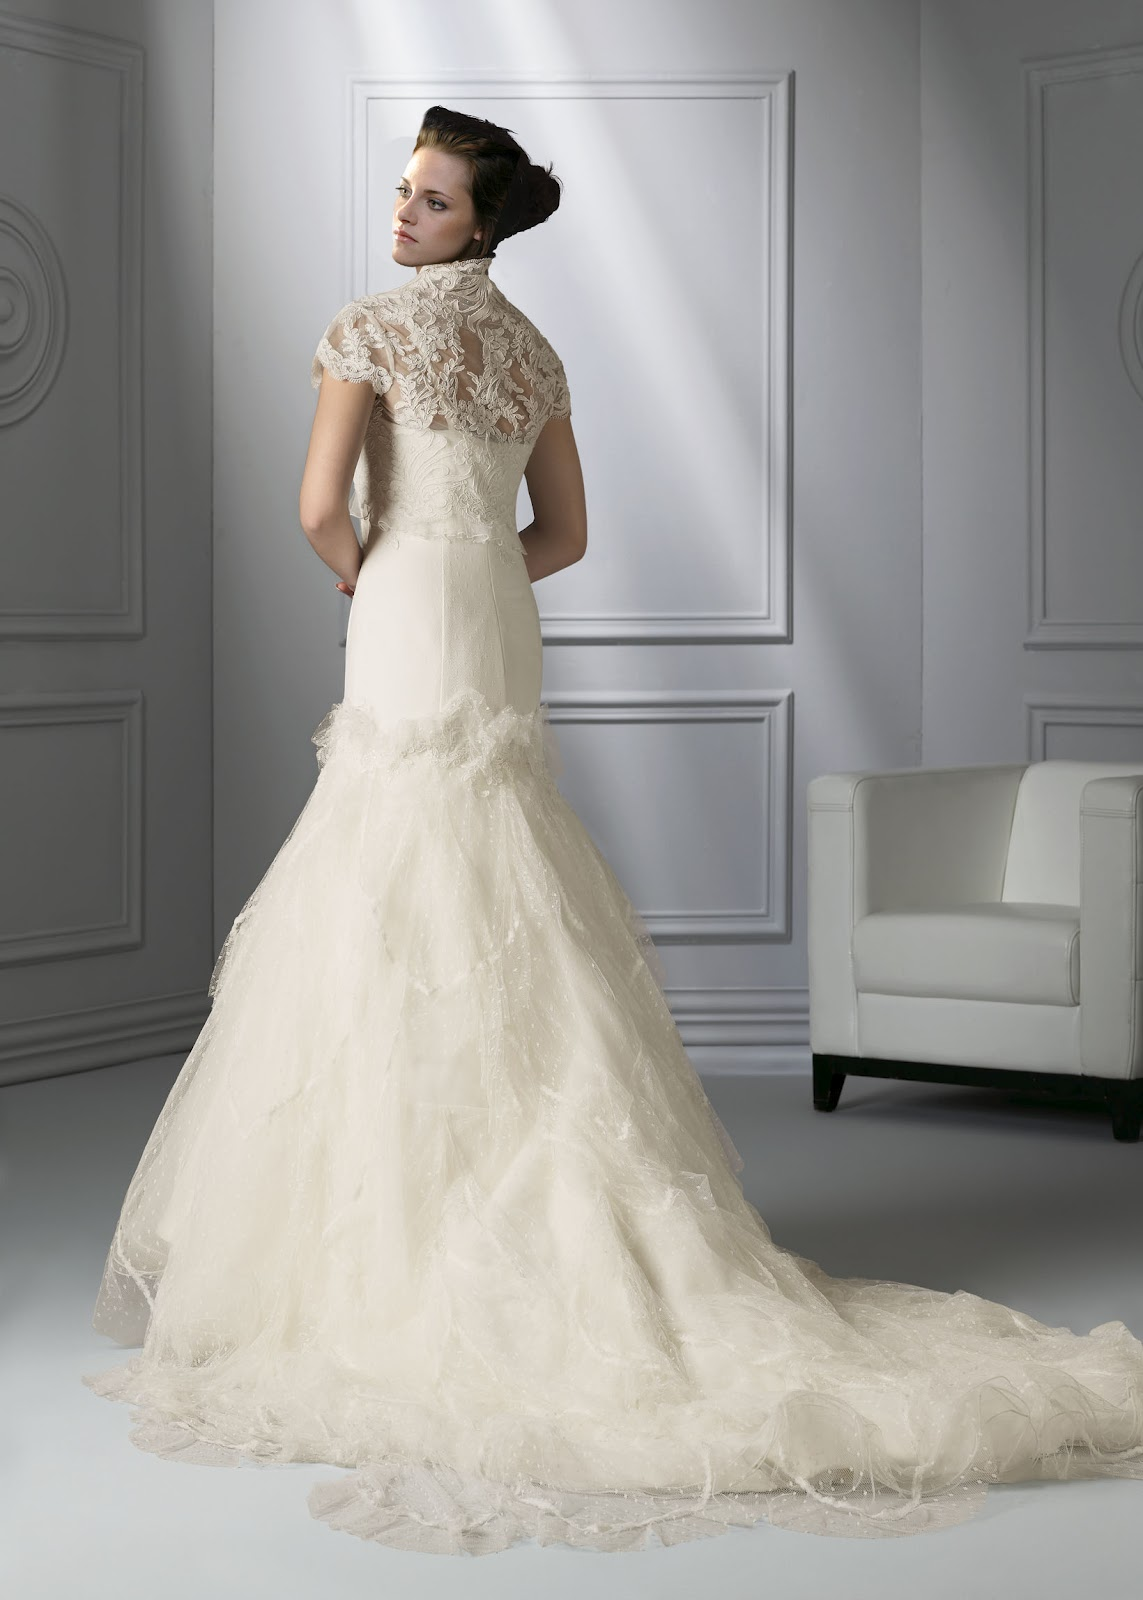 bella wedding dressknitting gallery